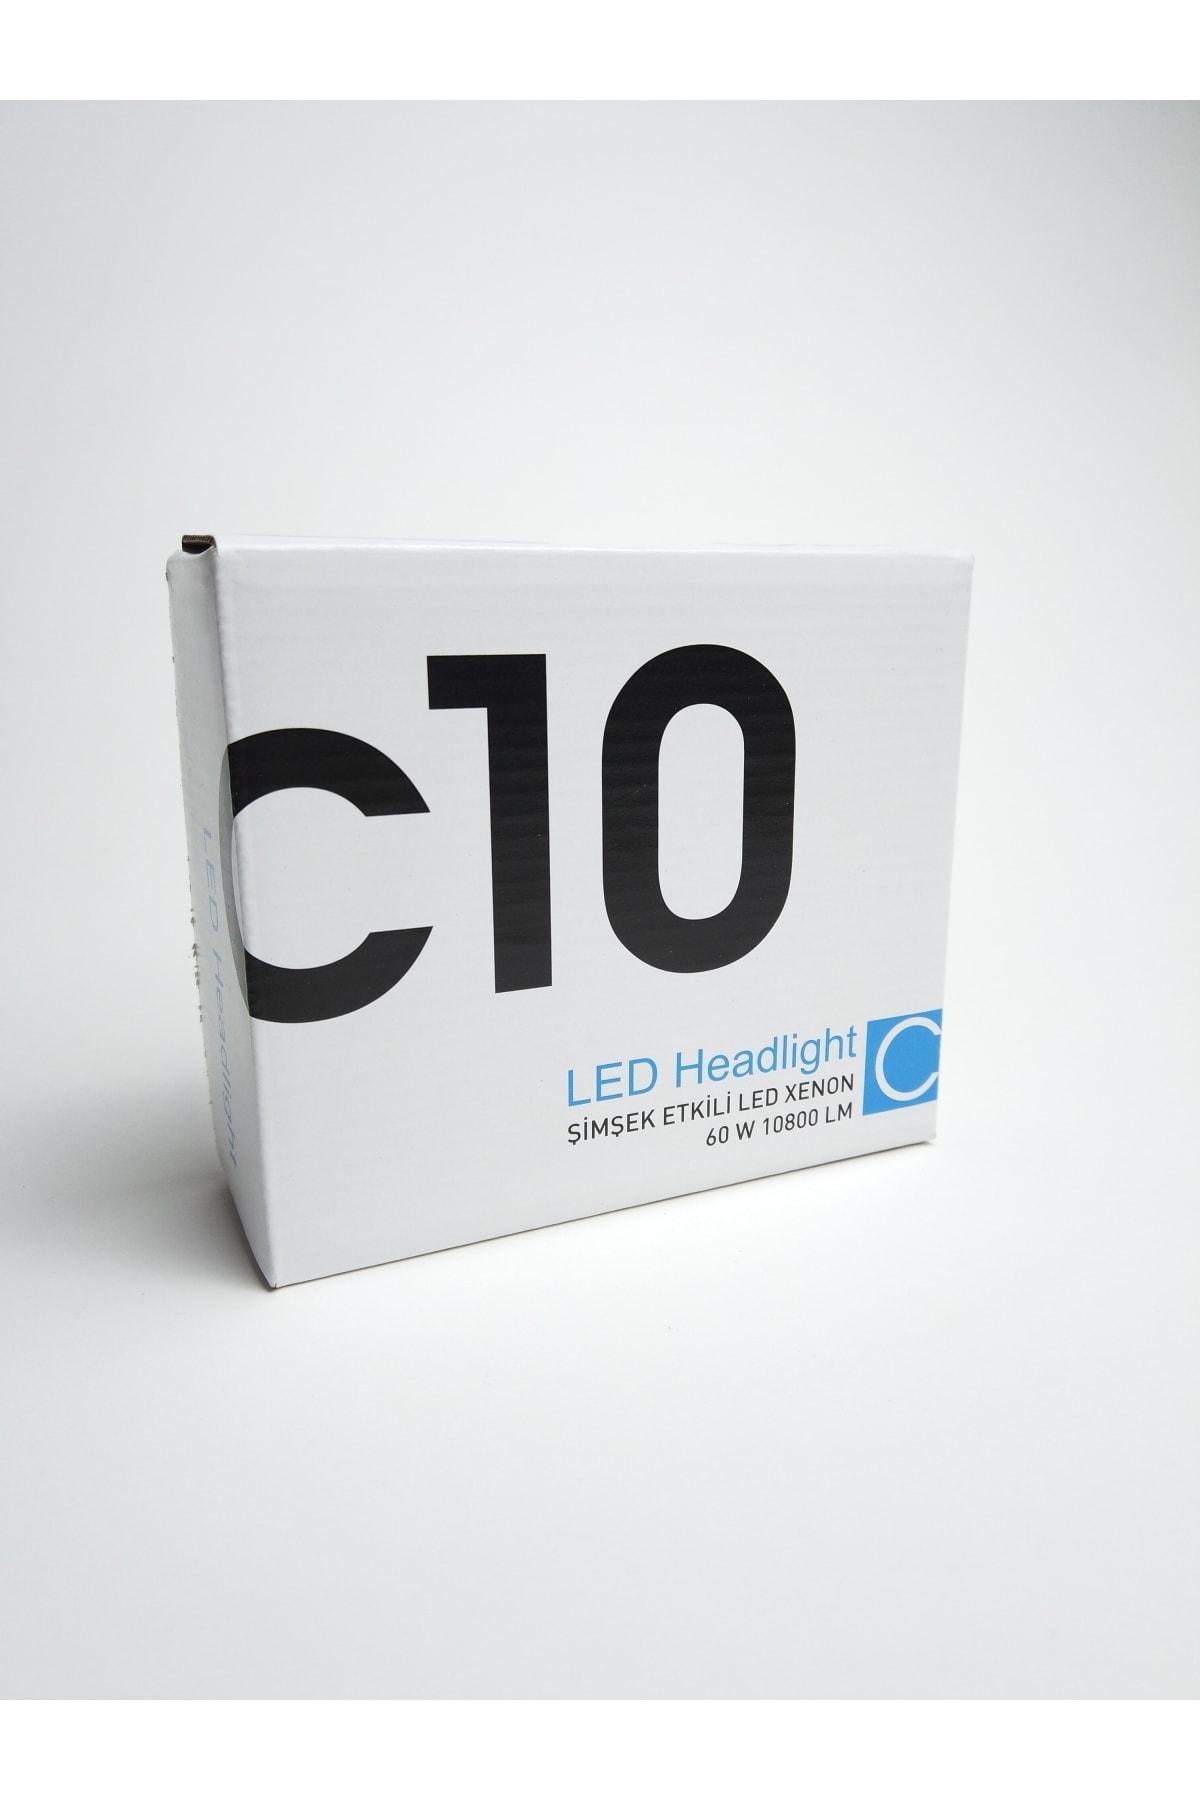 C10 H3 Led Xenon Far Led Zenon Ampulü Yeni Nesil Şimşek Etkili 2